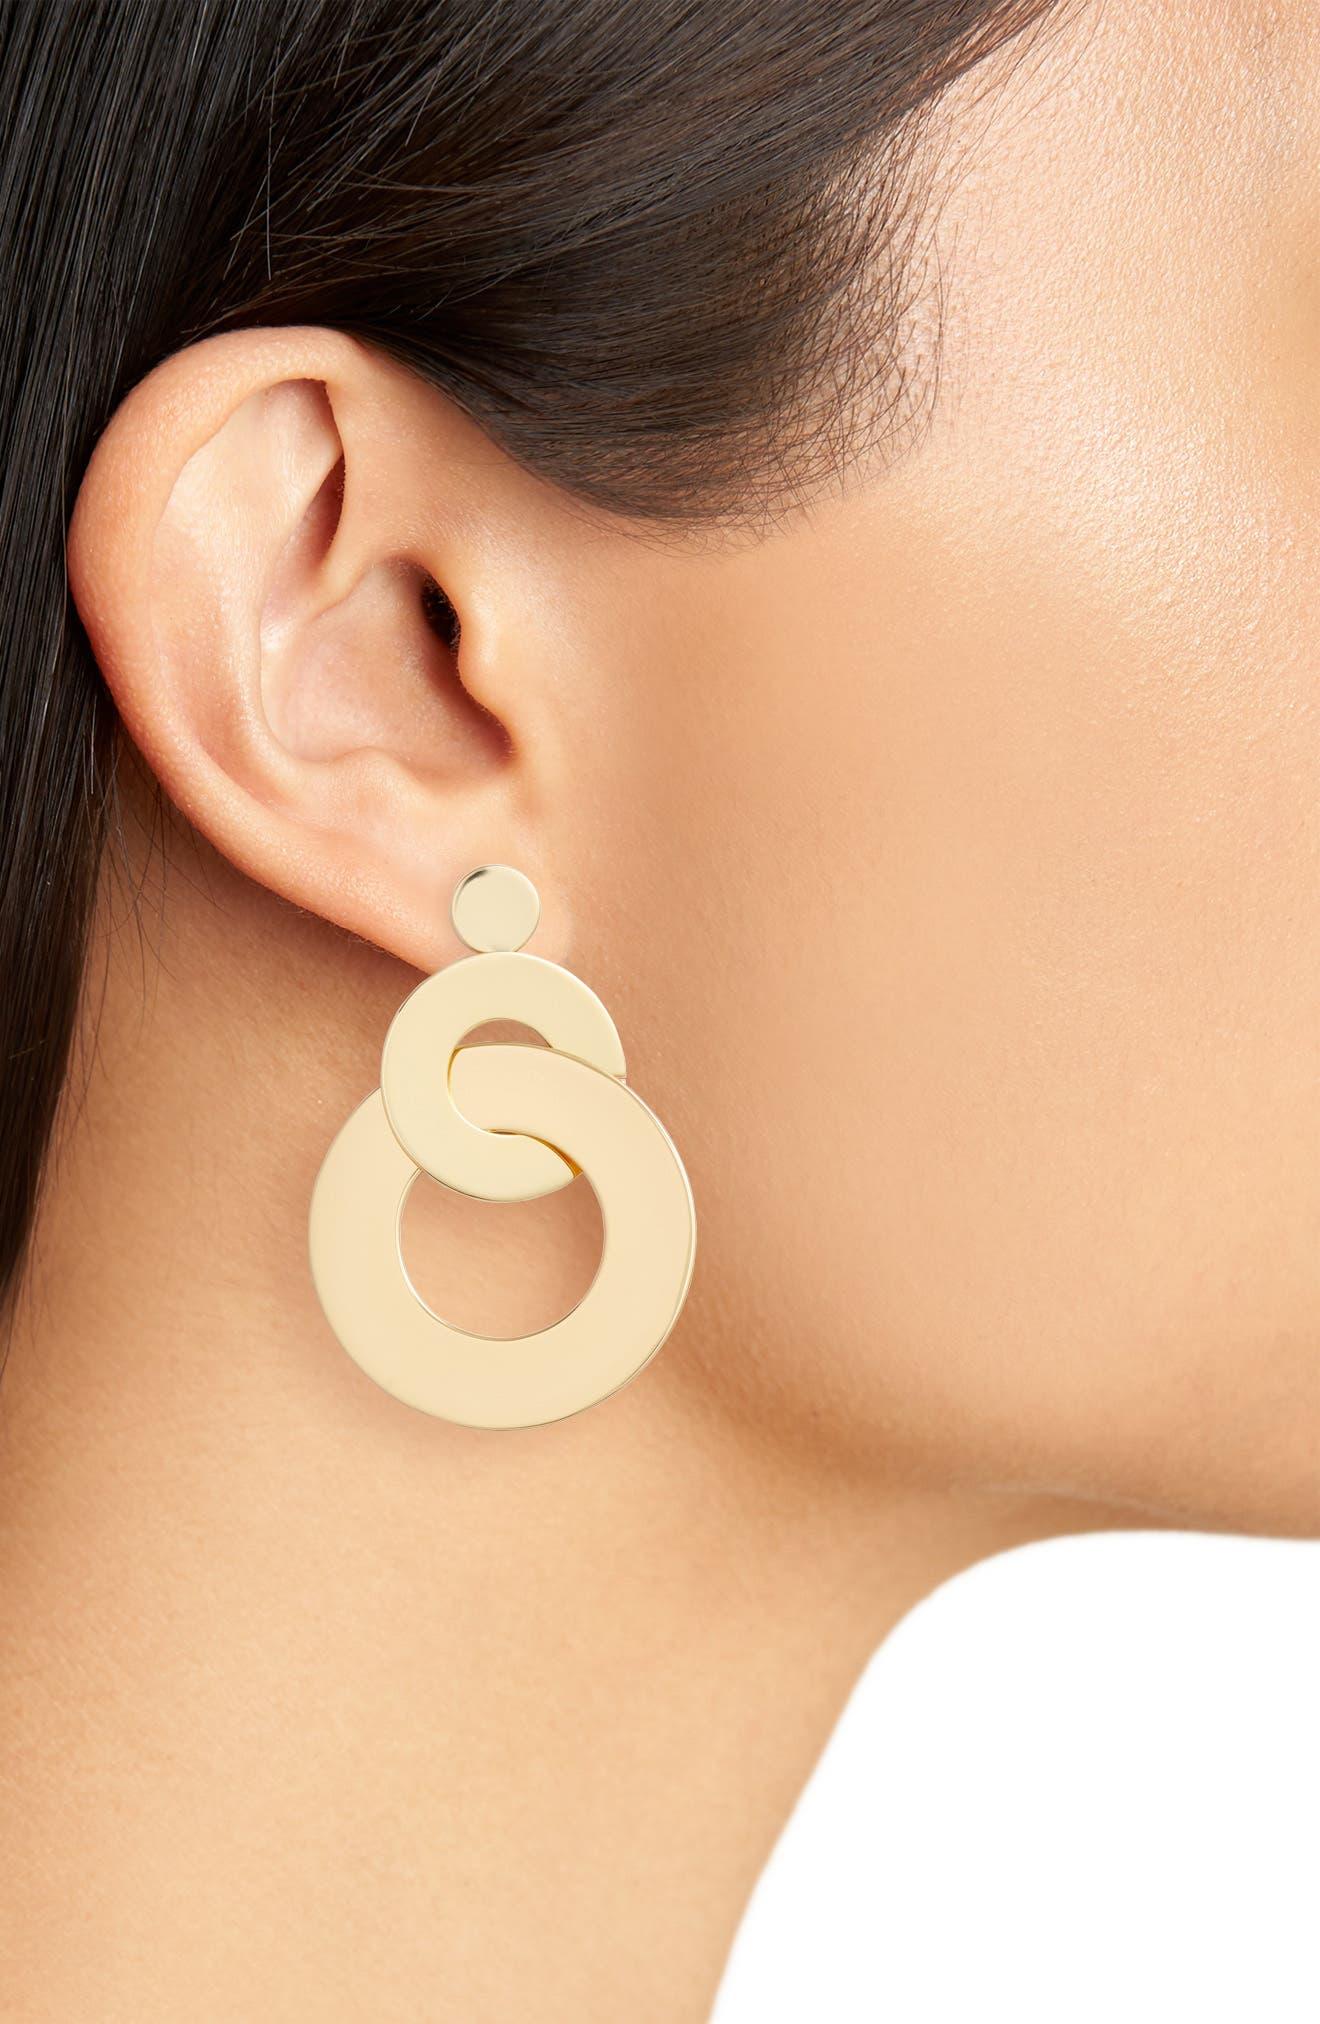 TGIF Earrings,                             Alternate thumbnail 2, color,                             GOLD